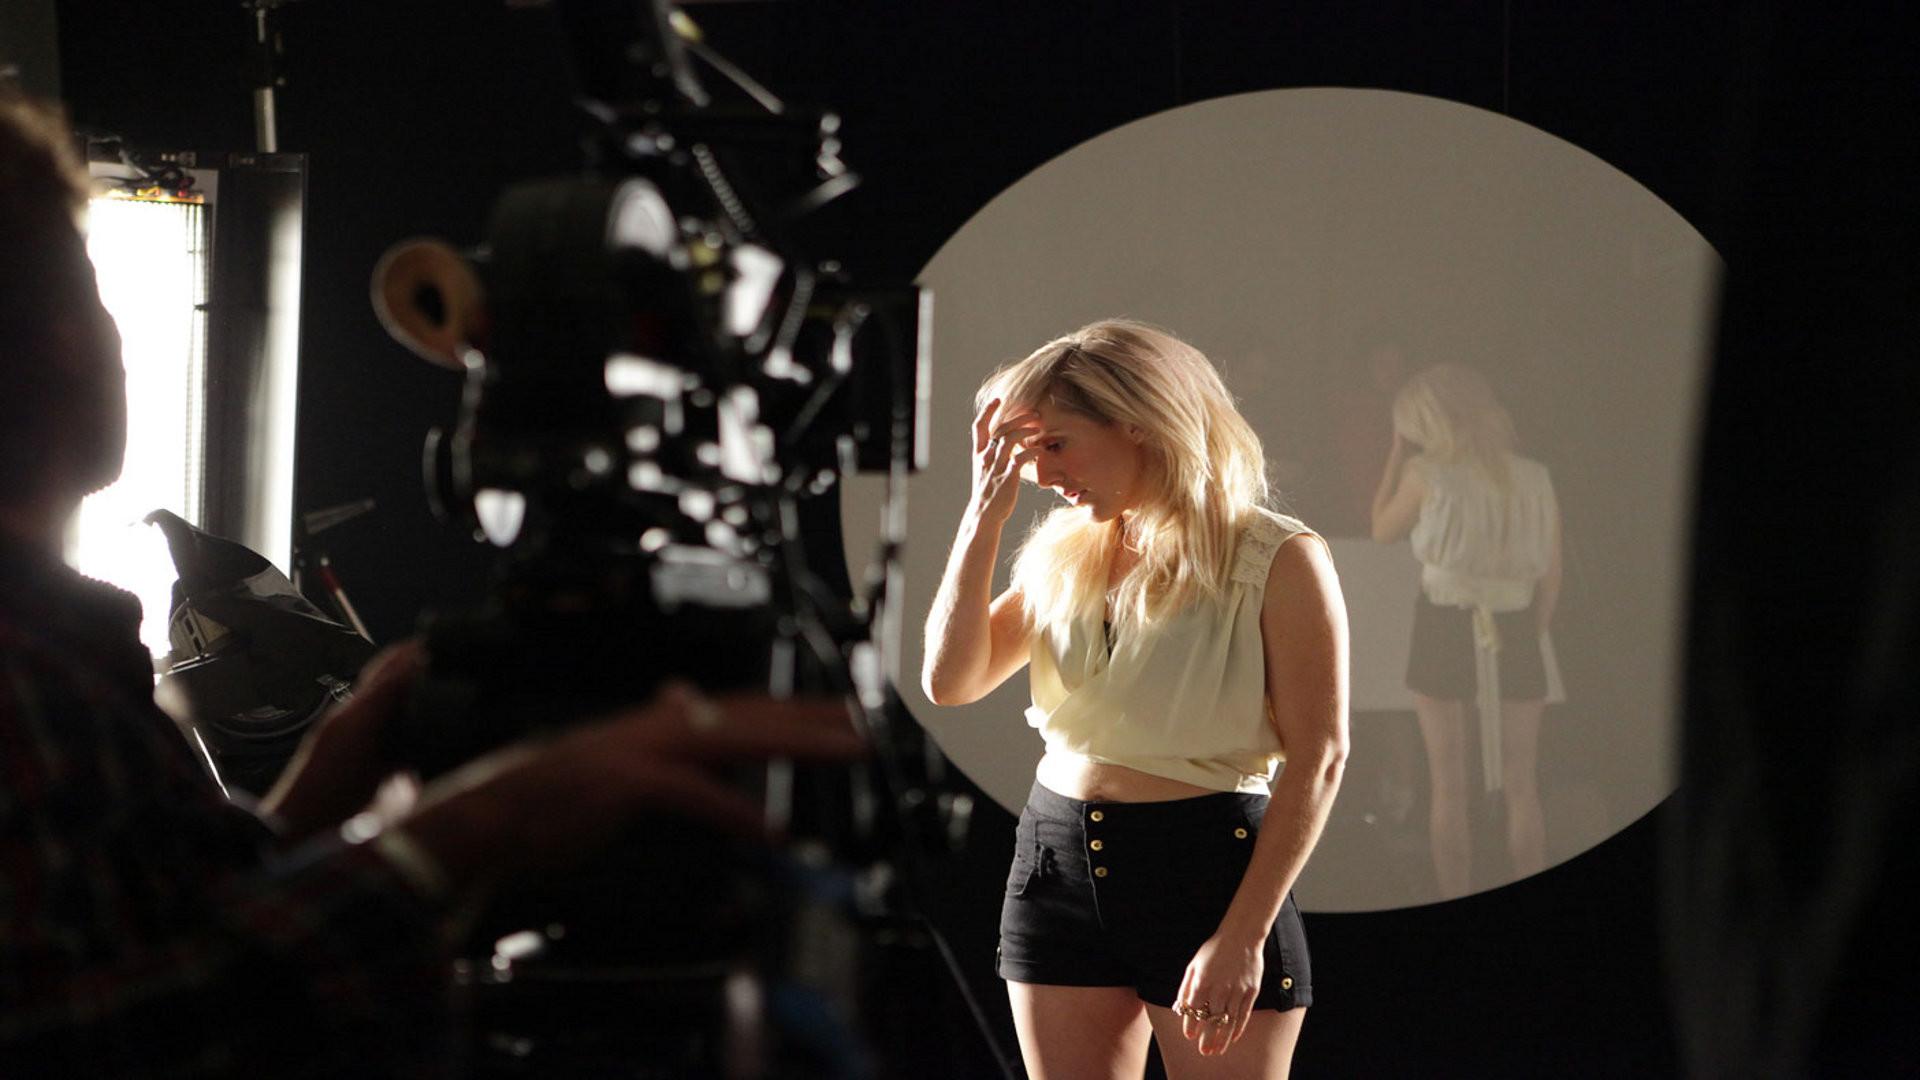 Music – Ellie Goulding Wallpaper